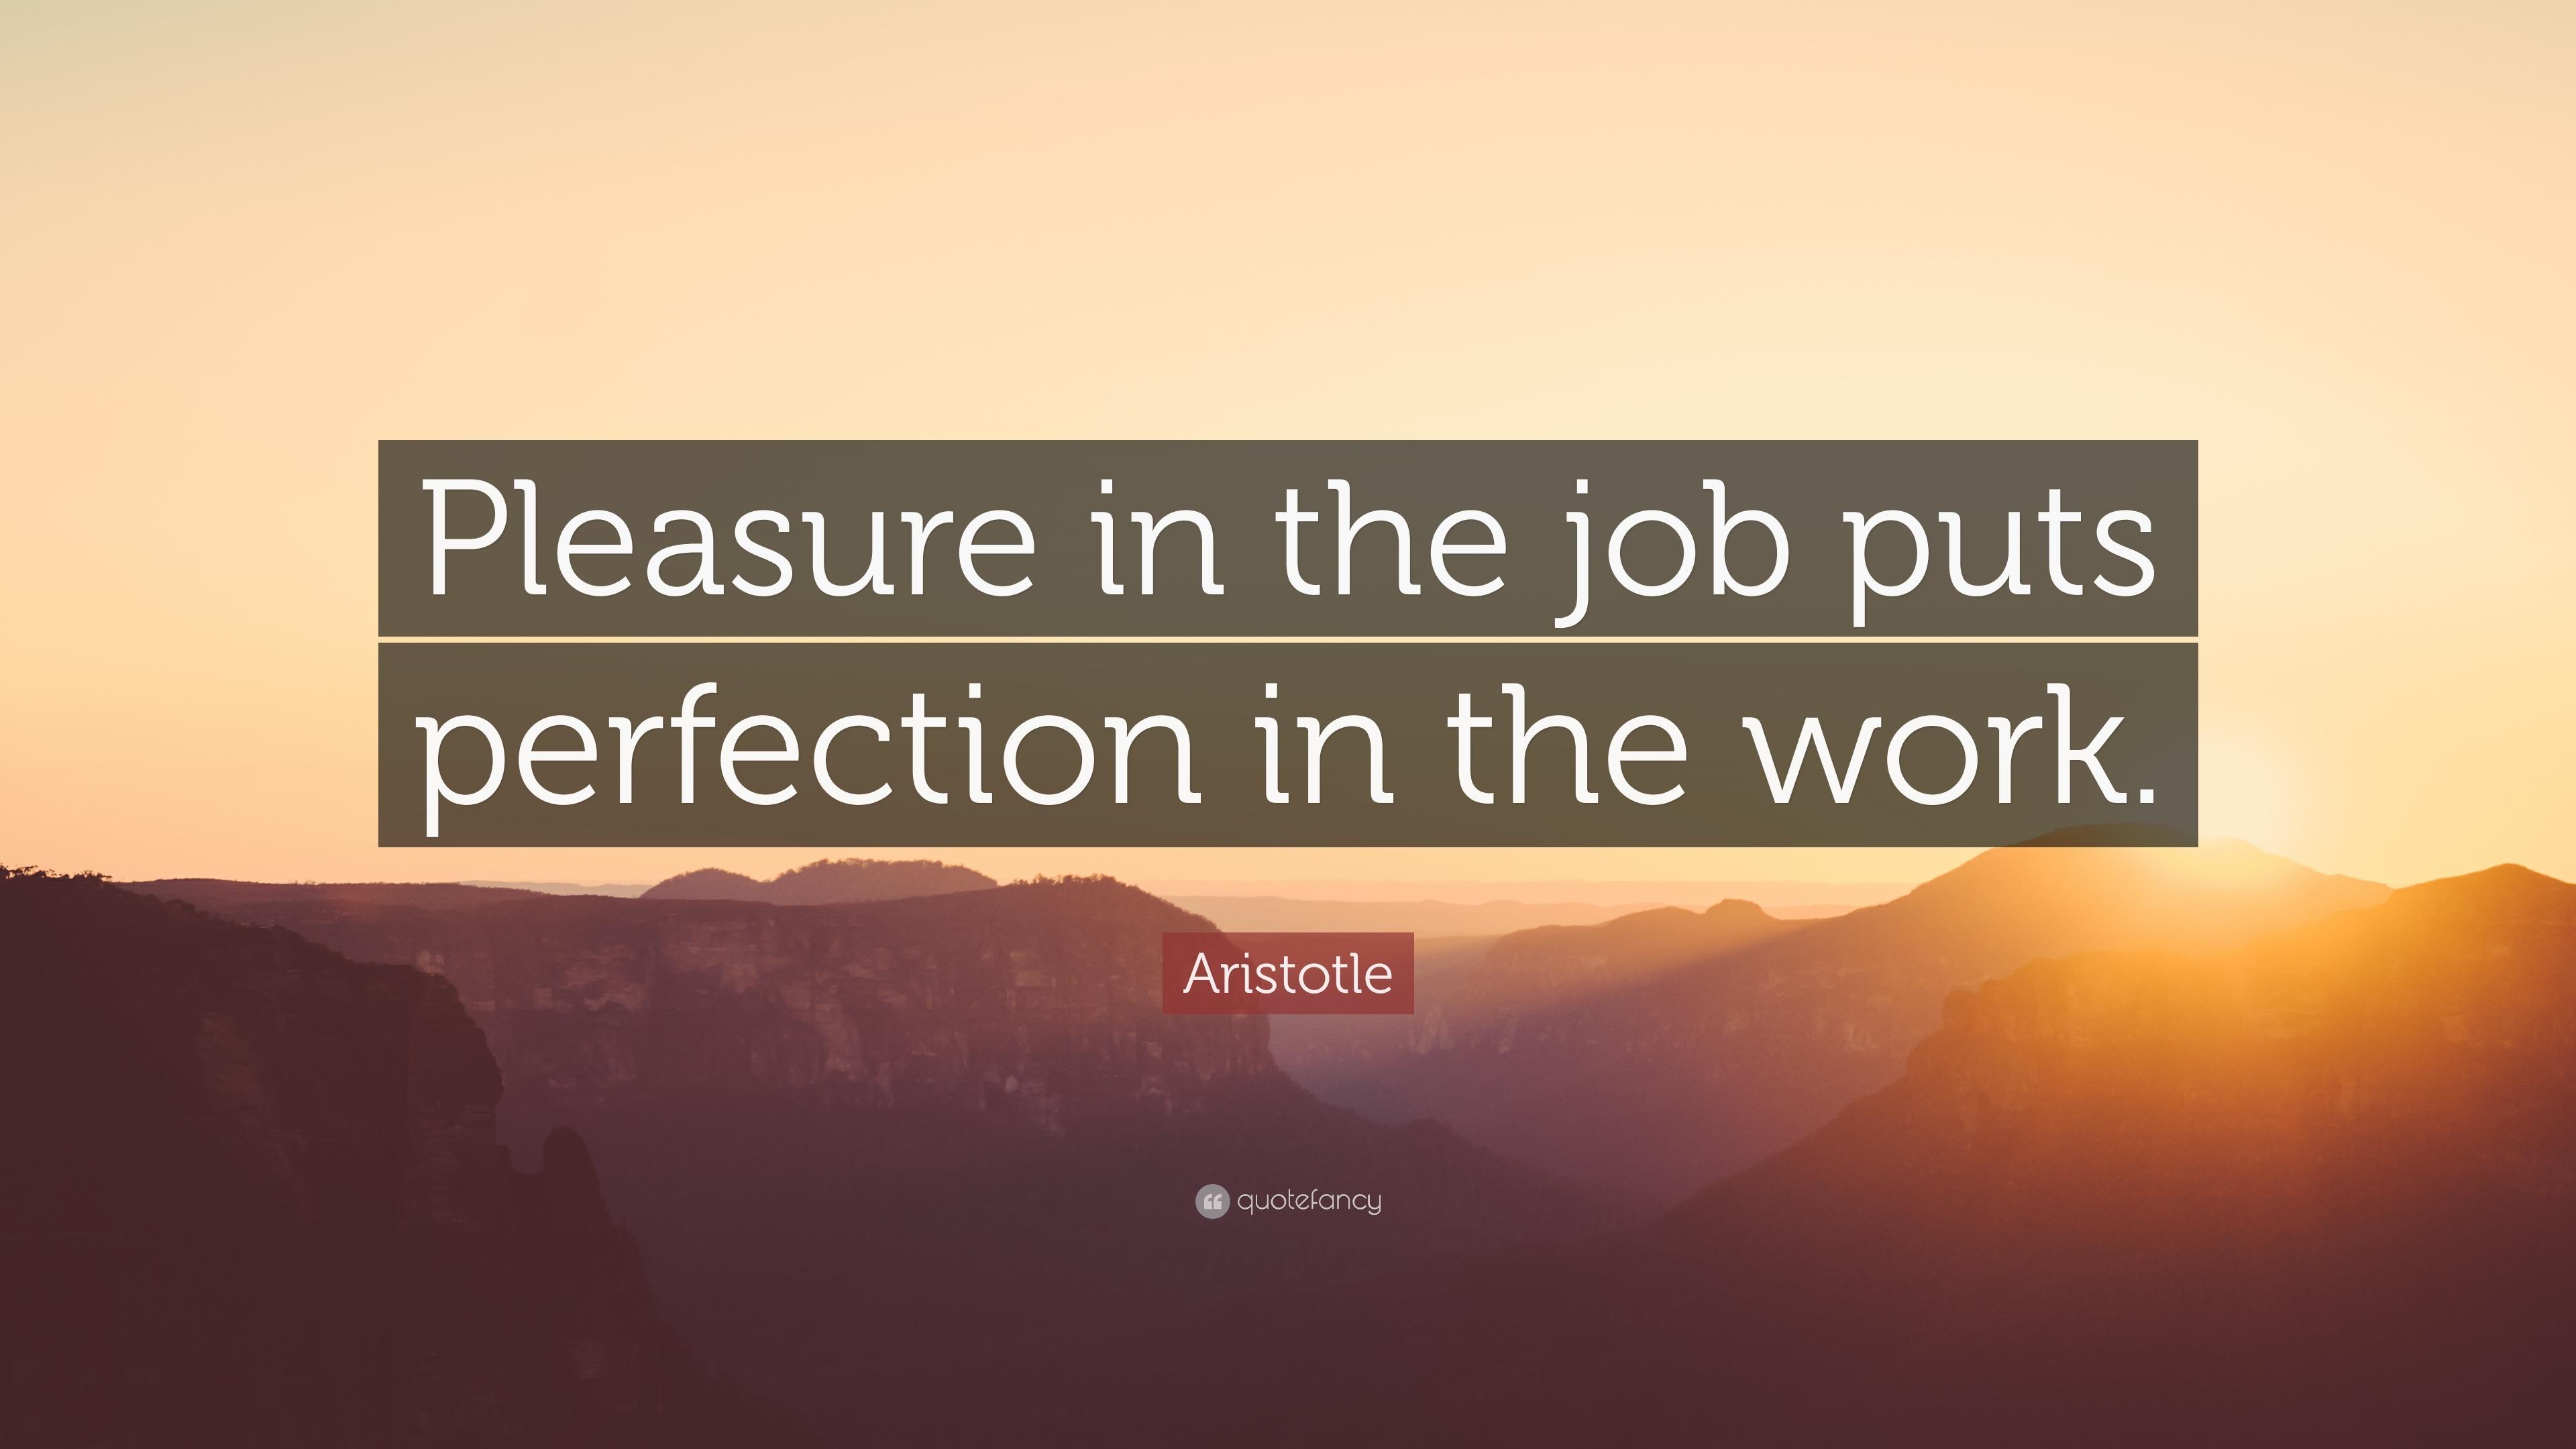 Aristotle Quotes Wallpaper Aristotle Quote Pleasure In The Job Puts Perfection In